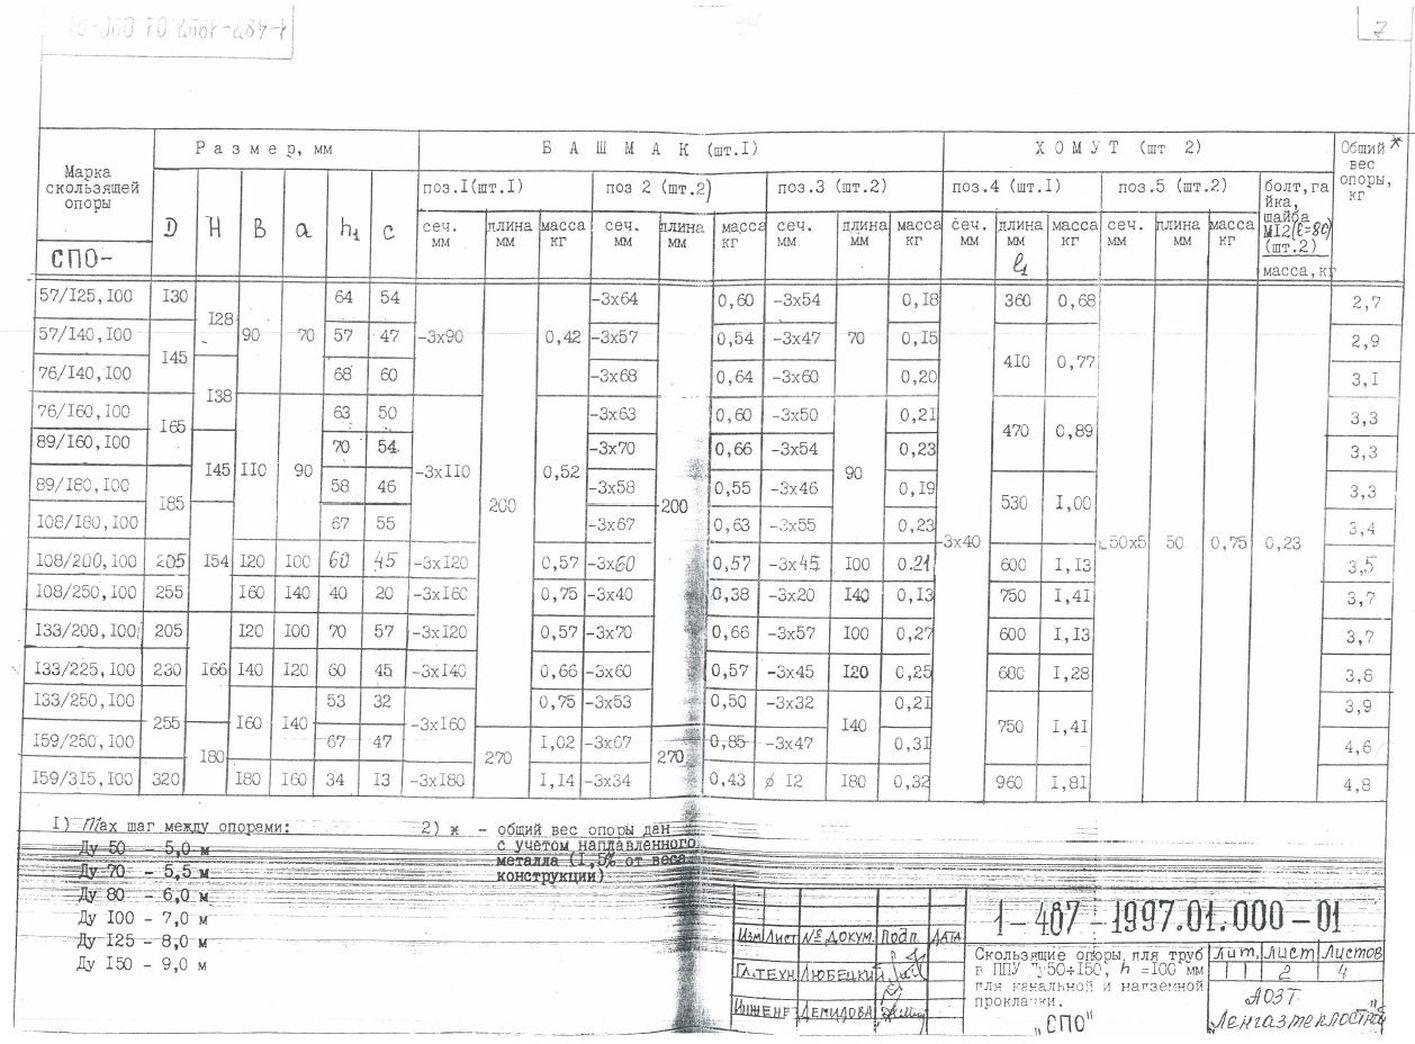 Опоры СПО ТД 1-487-1997.01.000-01 стр.2